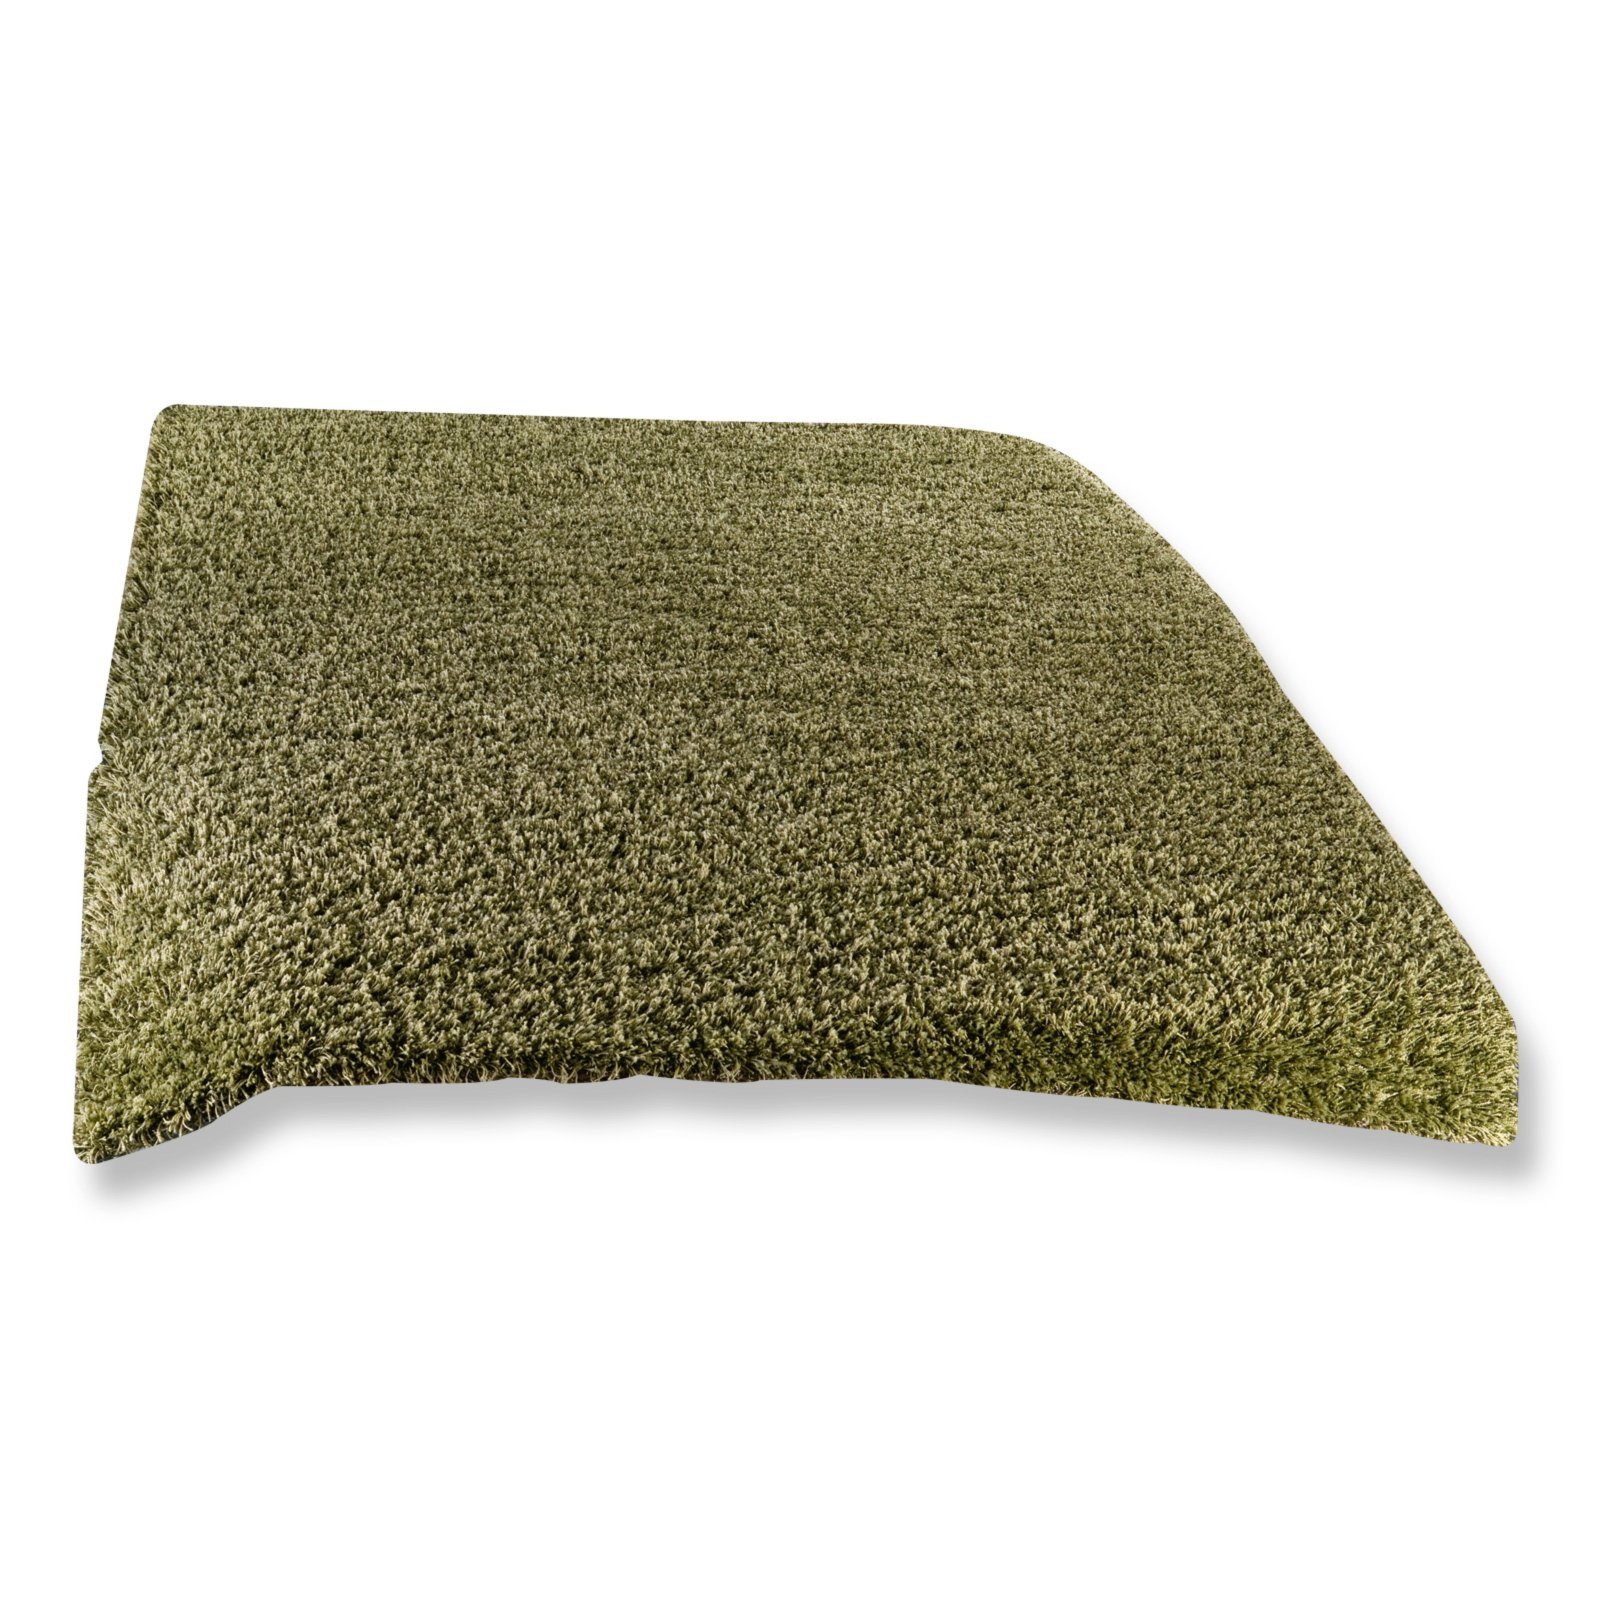 hochflor teppich shaggy plus gr n 200x290 cm hochflor shaggyteppiche teppiche. Black Bedroom Furniture Sets. Home Design Ideas